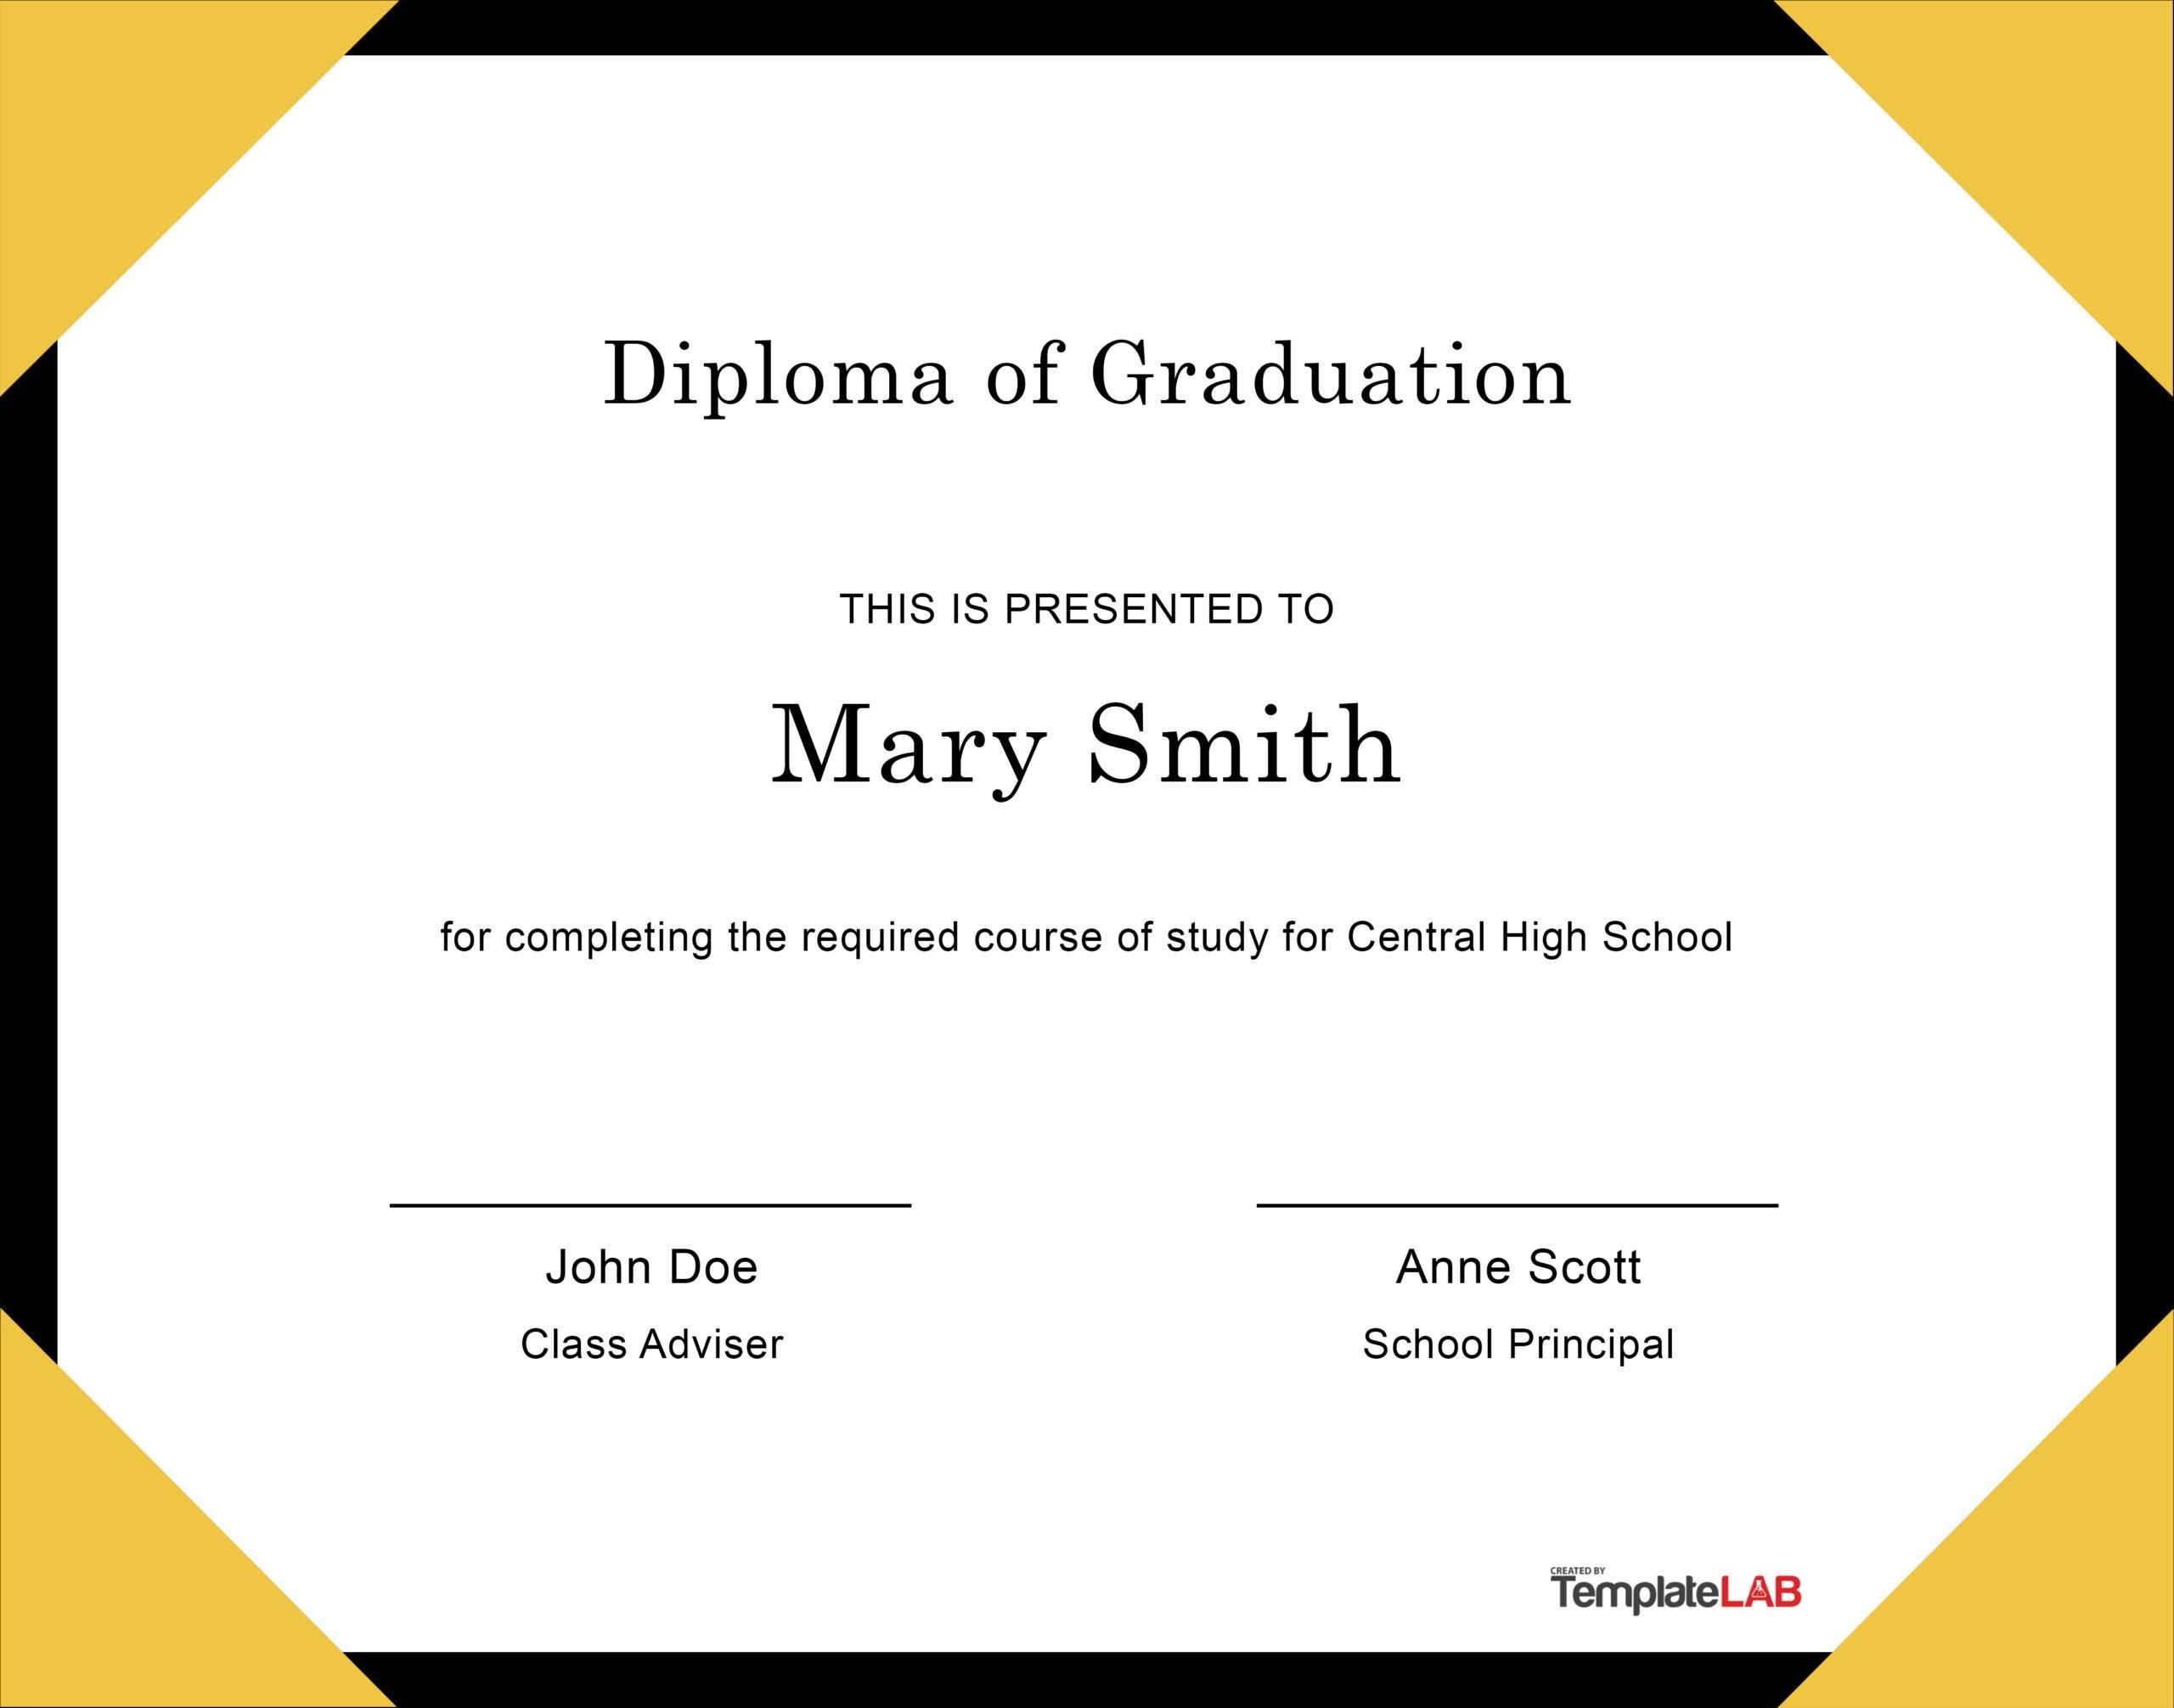 Free Diploma Template 13 - TemplateLab.com